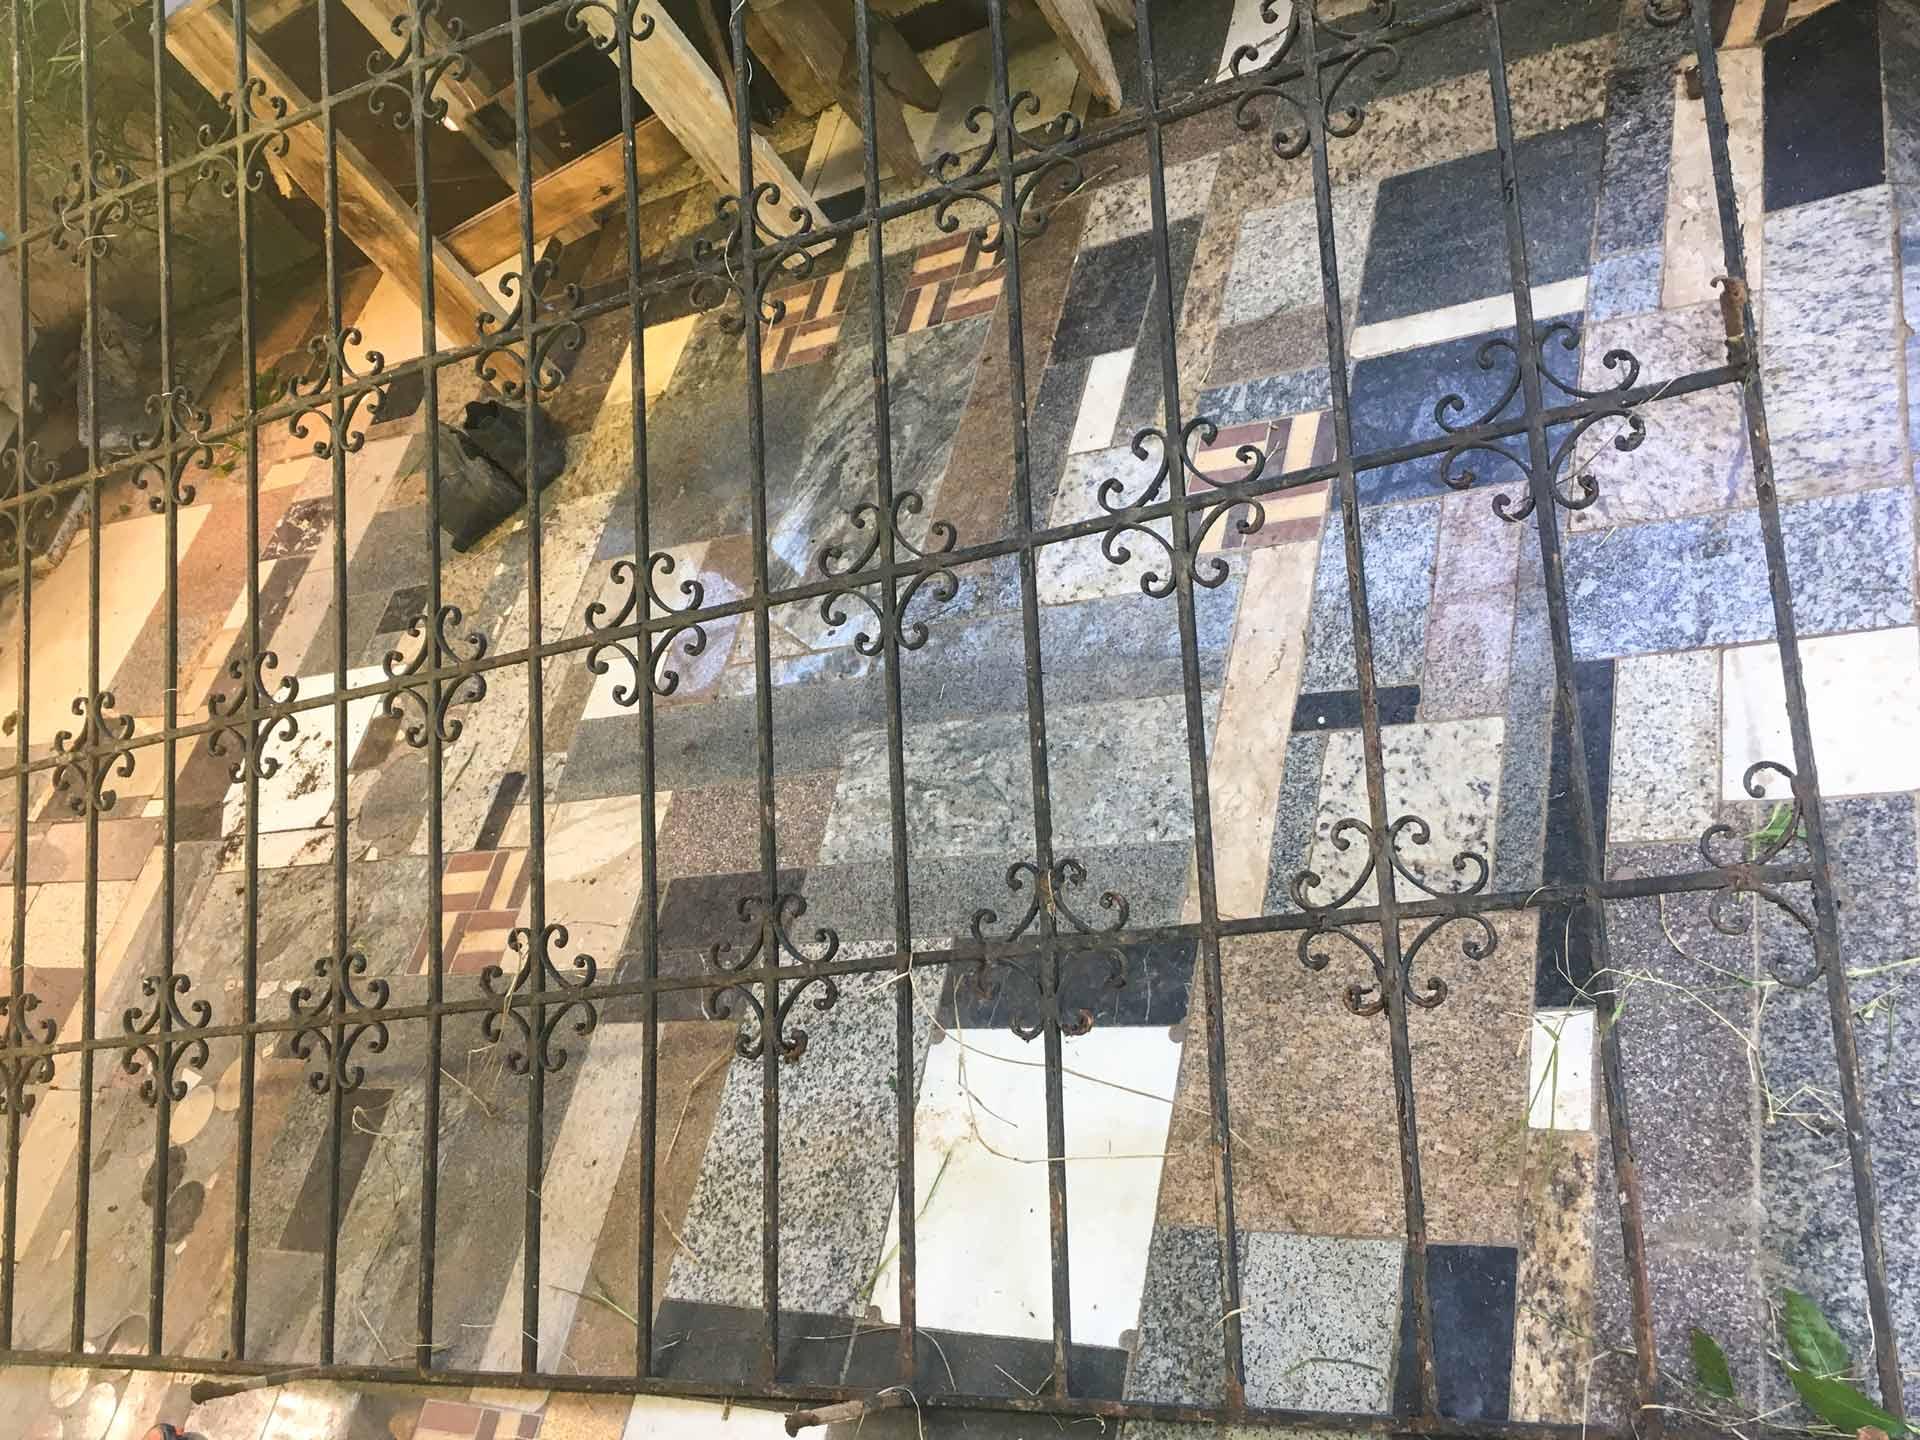 cabeceira de ferro diy faca voce mesmo pintura grade de janela